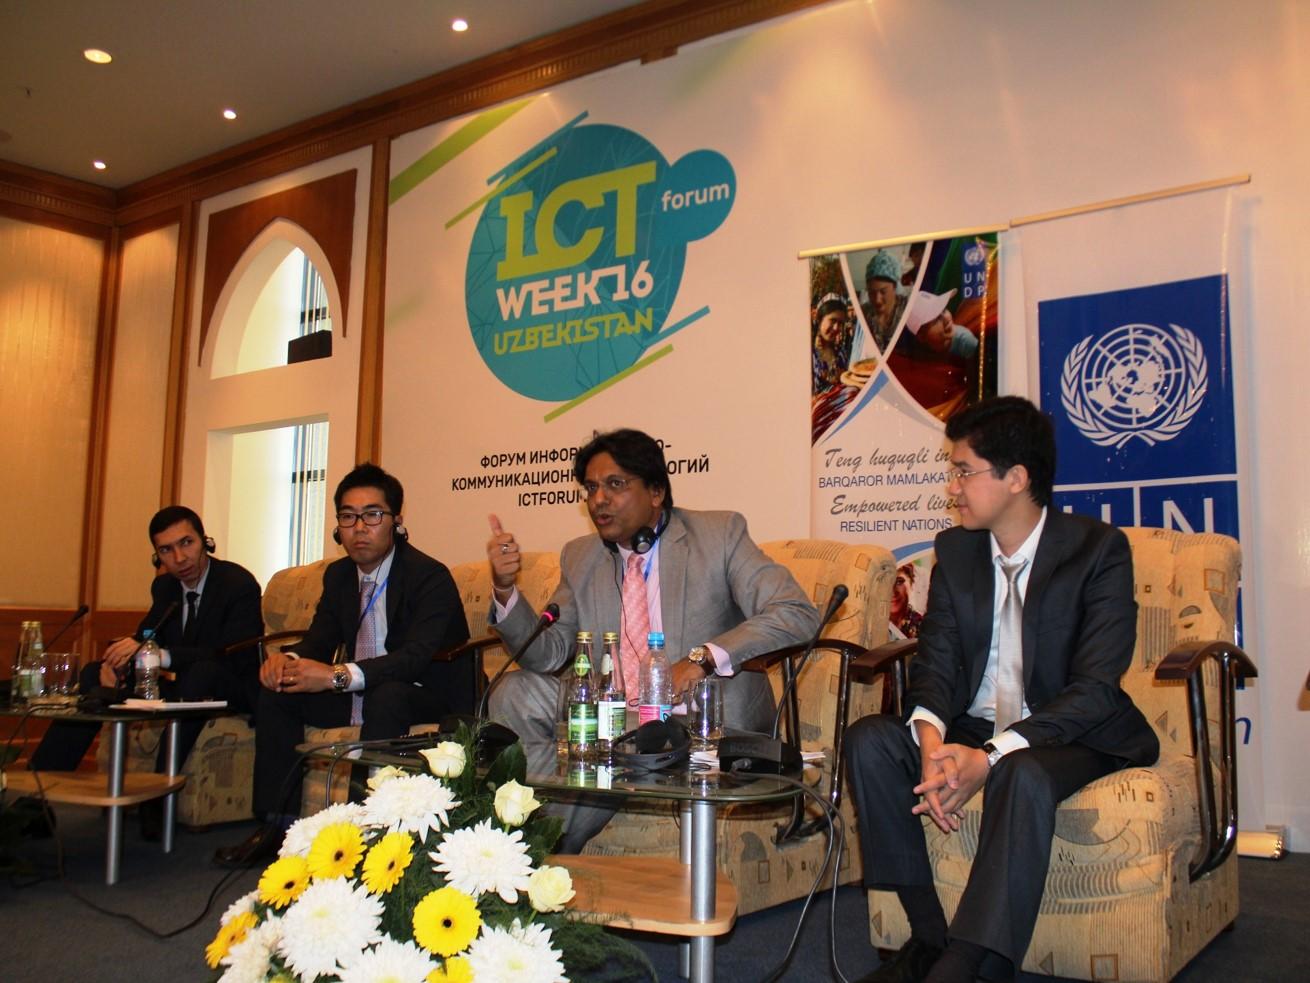 E- Governance and Information Communication